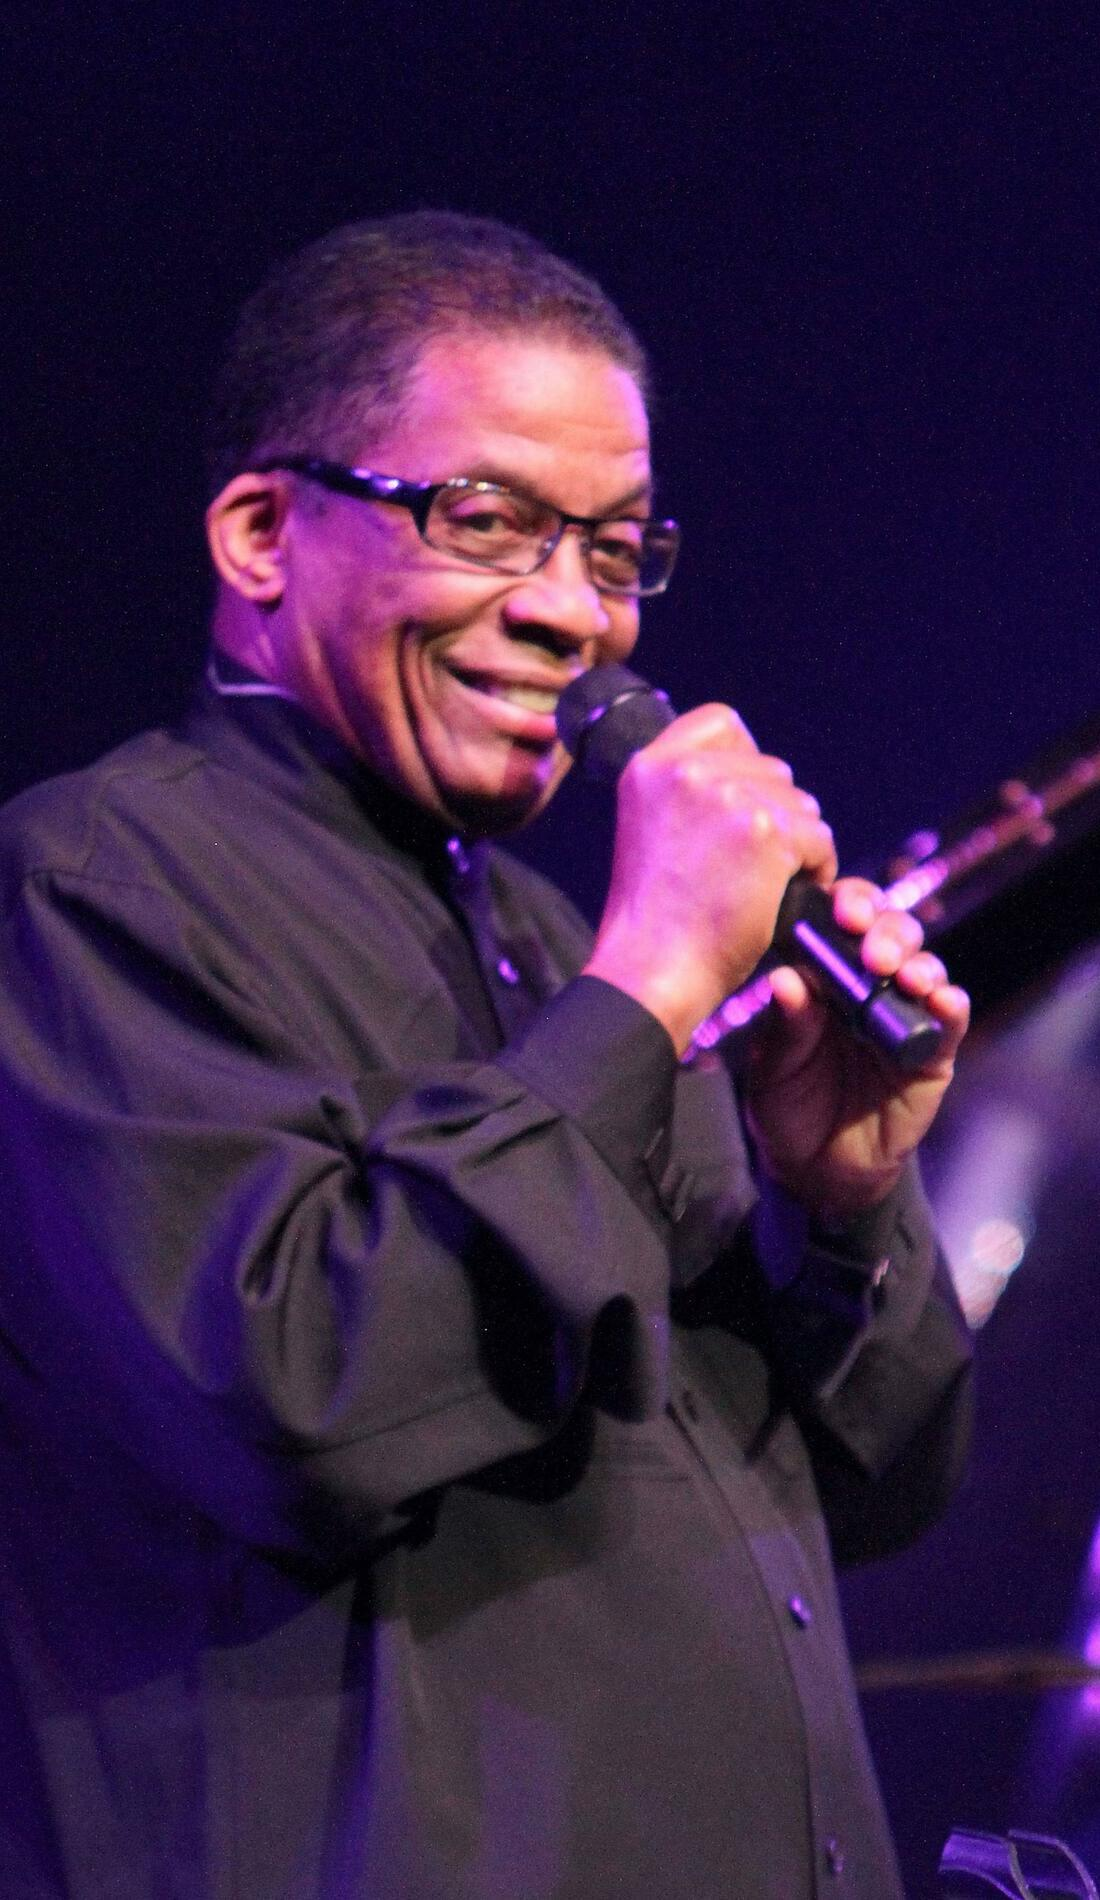 A Herbie Hancock live event